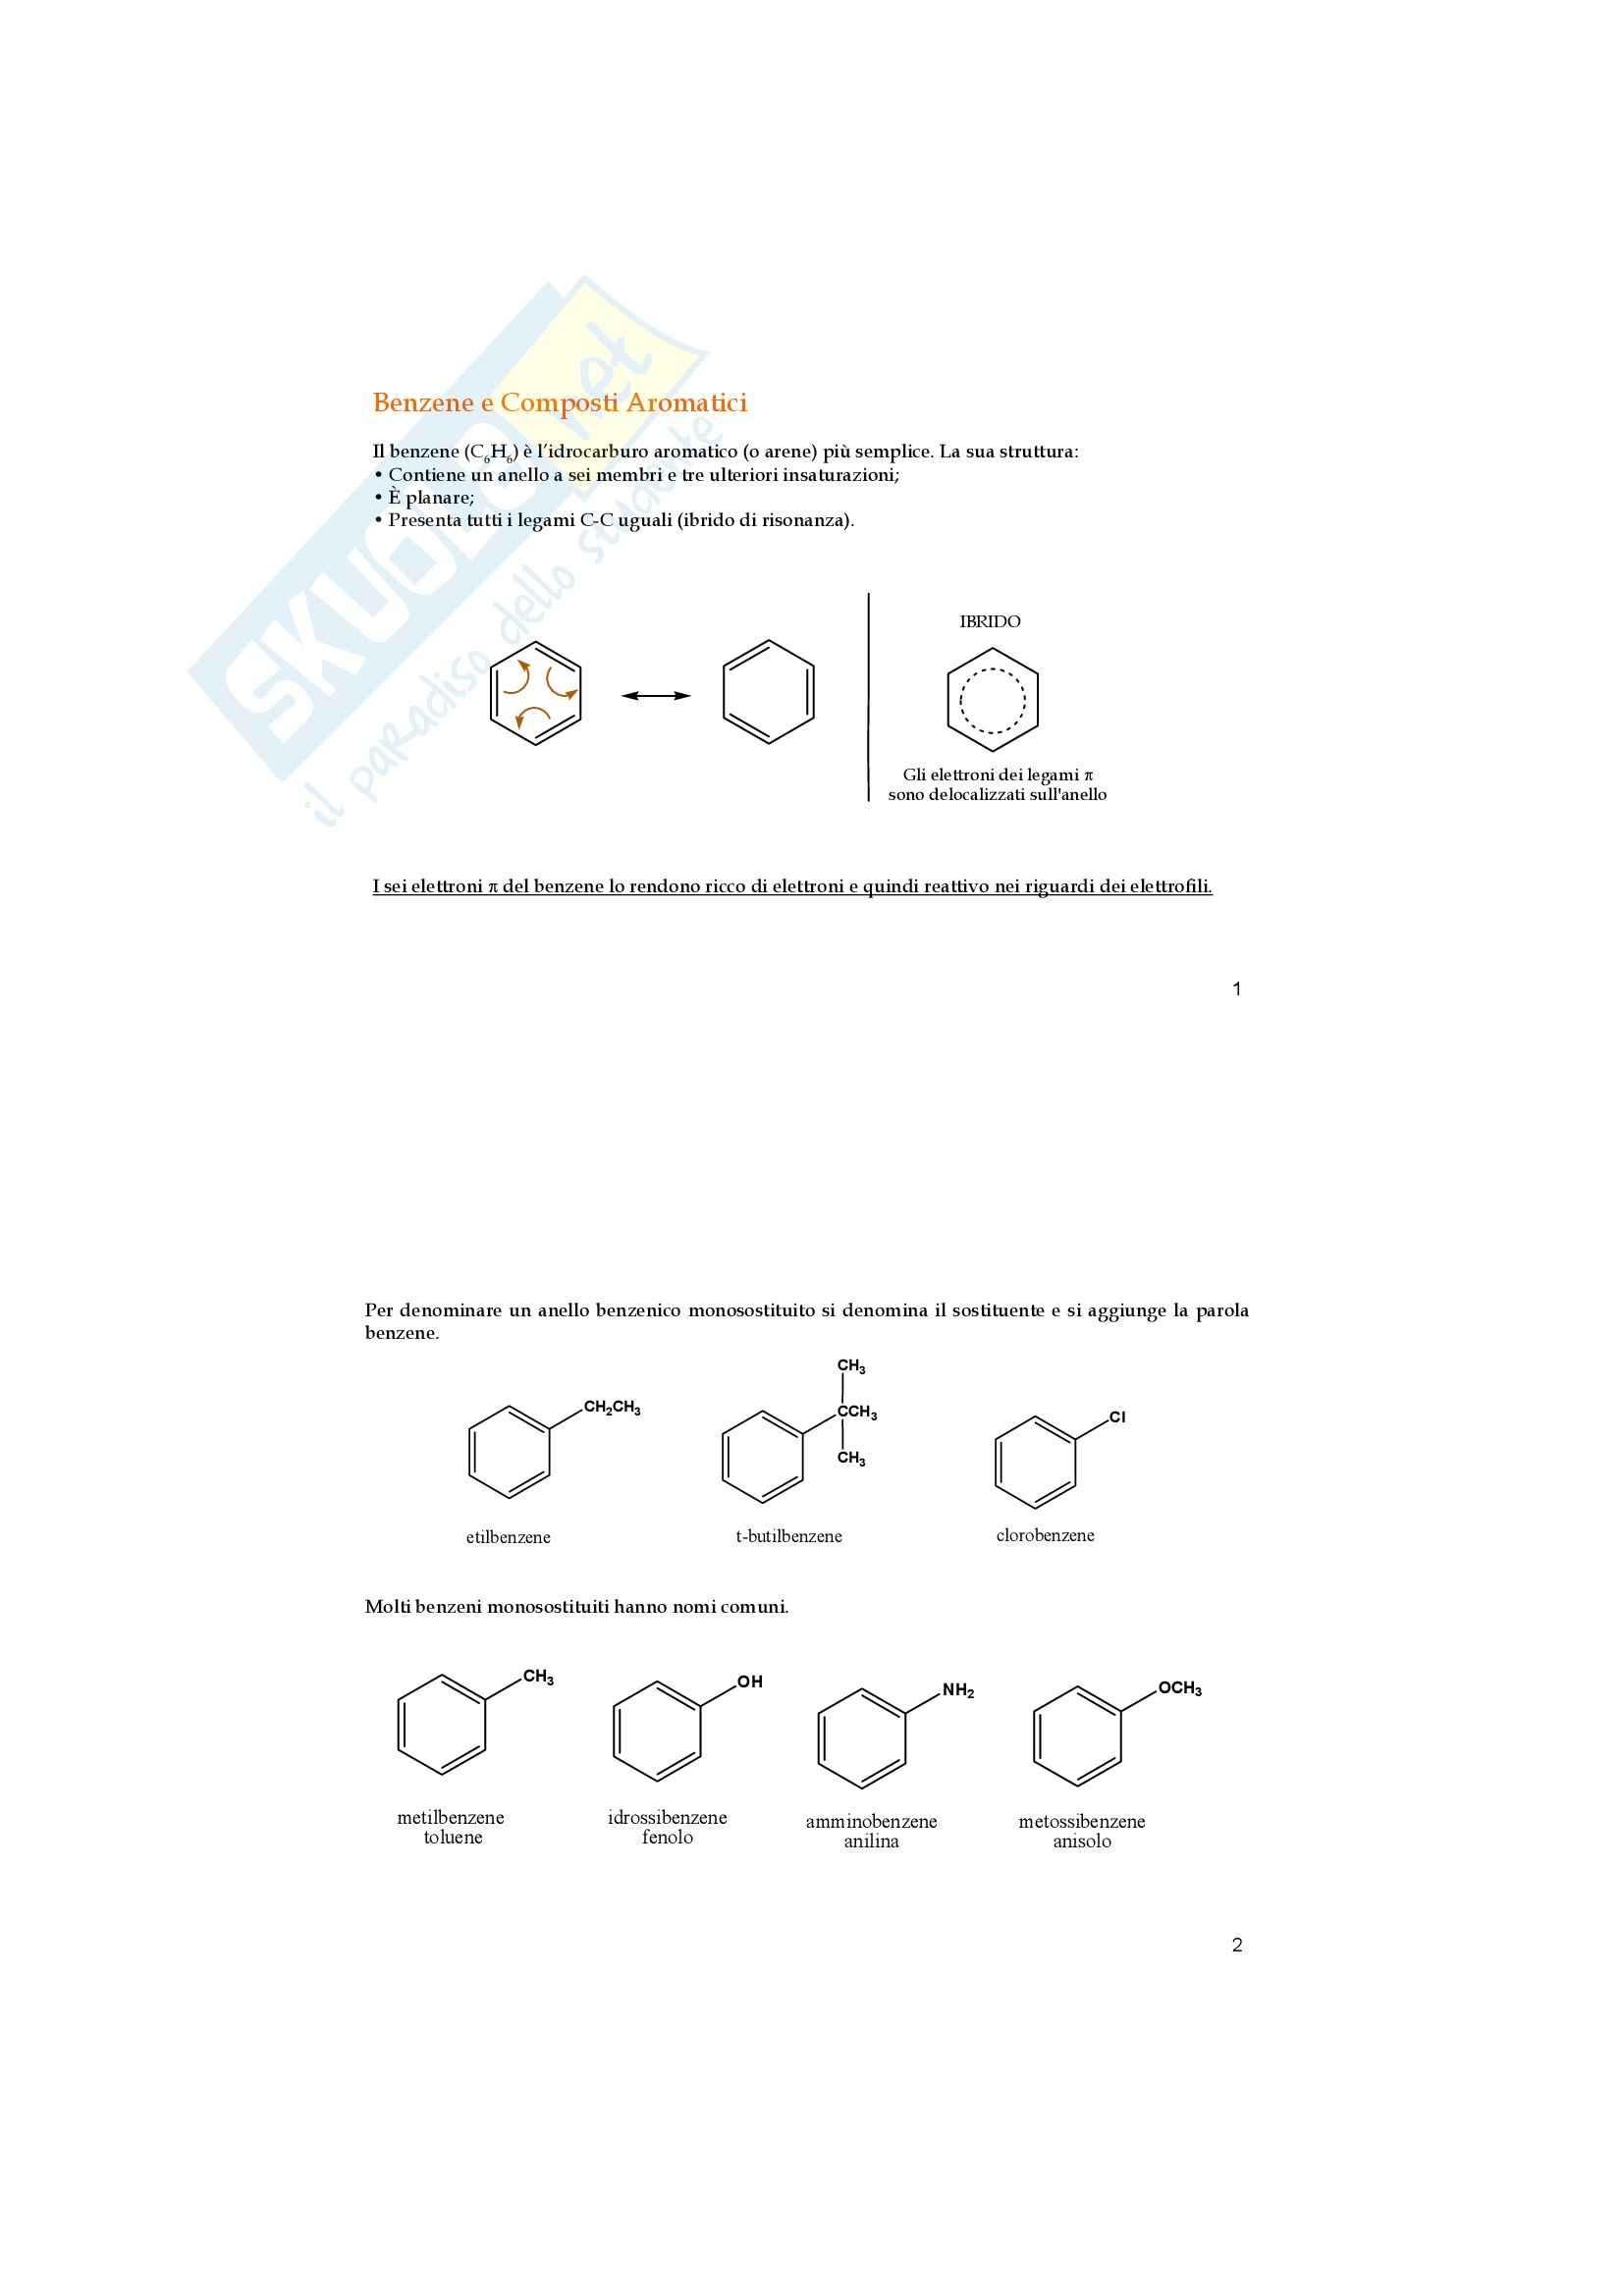 Chimica organica - composti aromatici